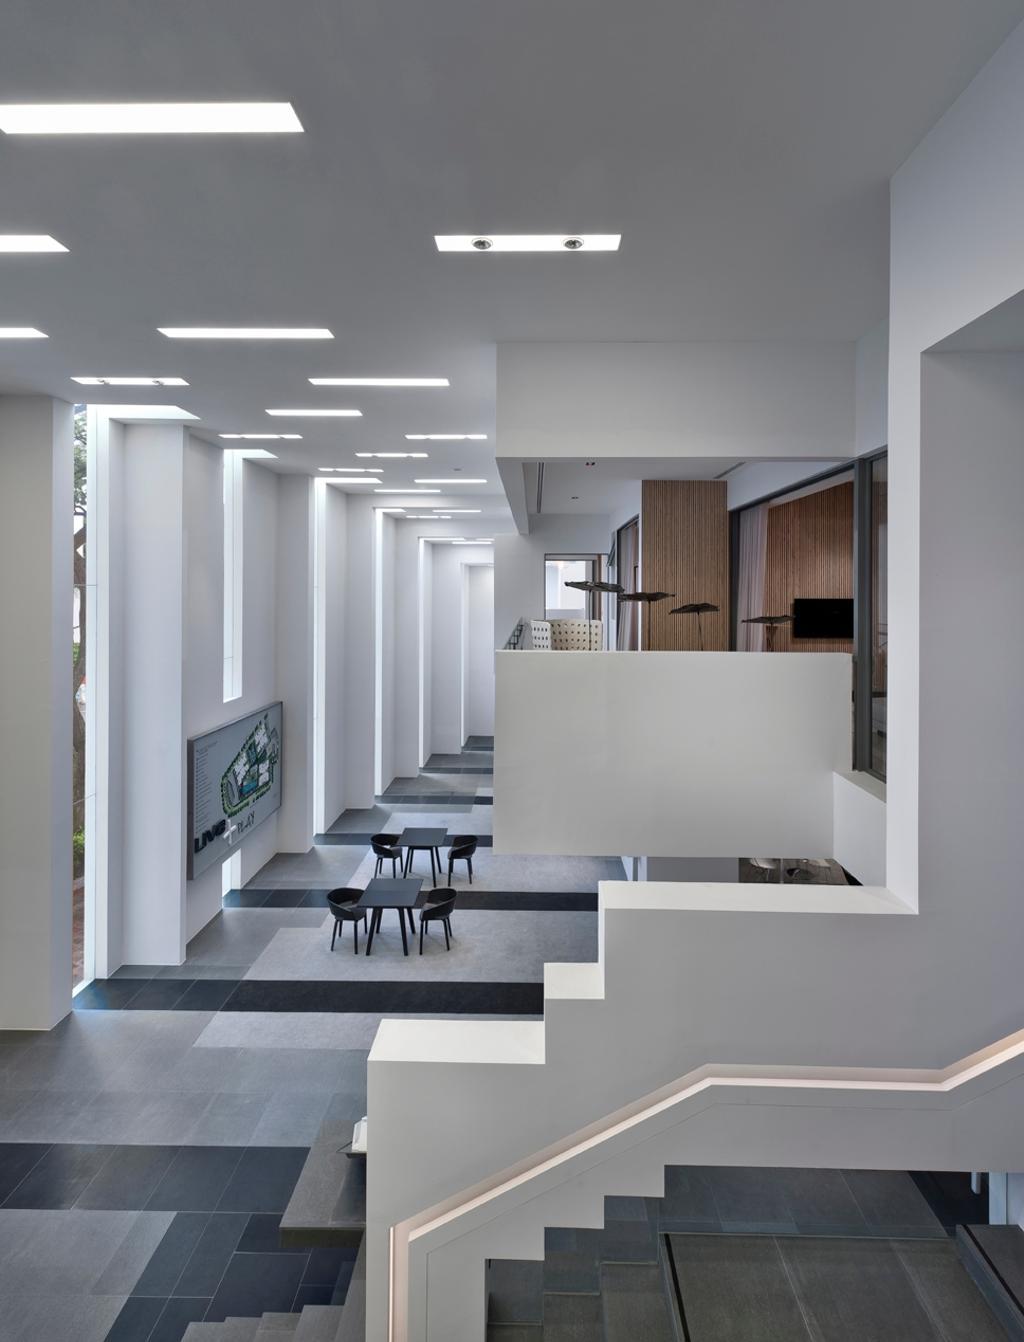 UOL Edge, Commercial, Architect, Ministry of Design, Modern, Grey Floor, Gray Floor, Steps, White Ceiling, White Walls, Glass Walls, White Pillars, Dining Table, Furniture, Table